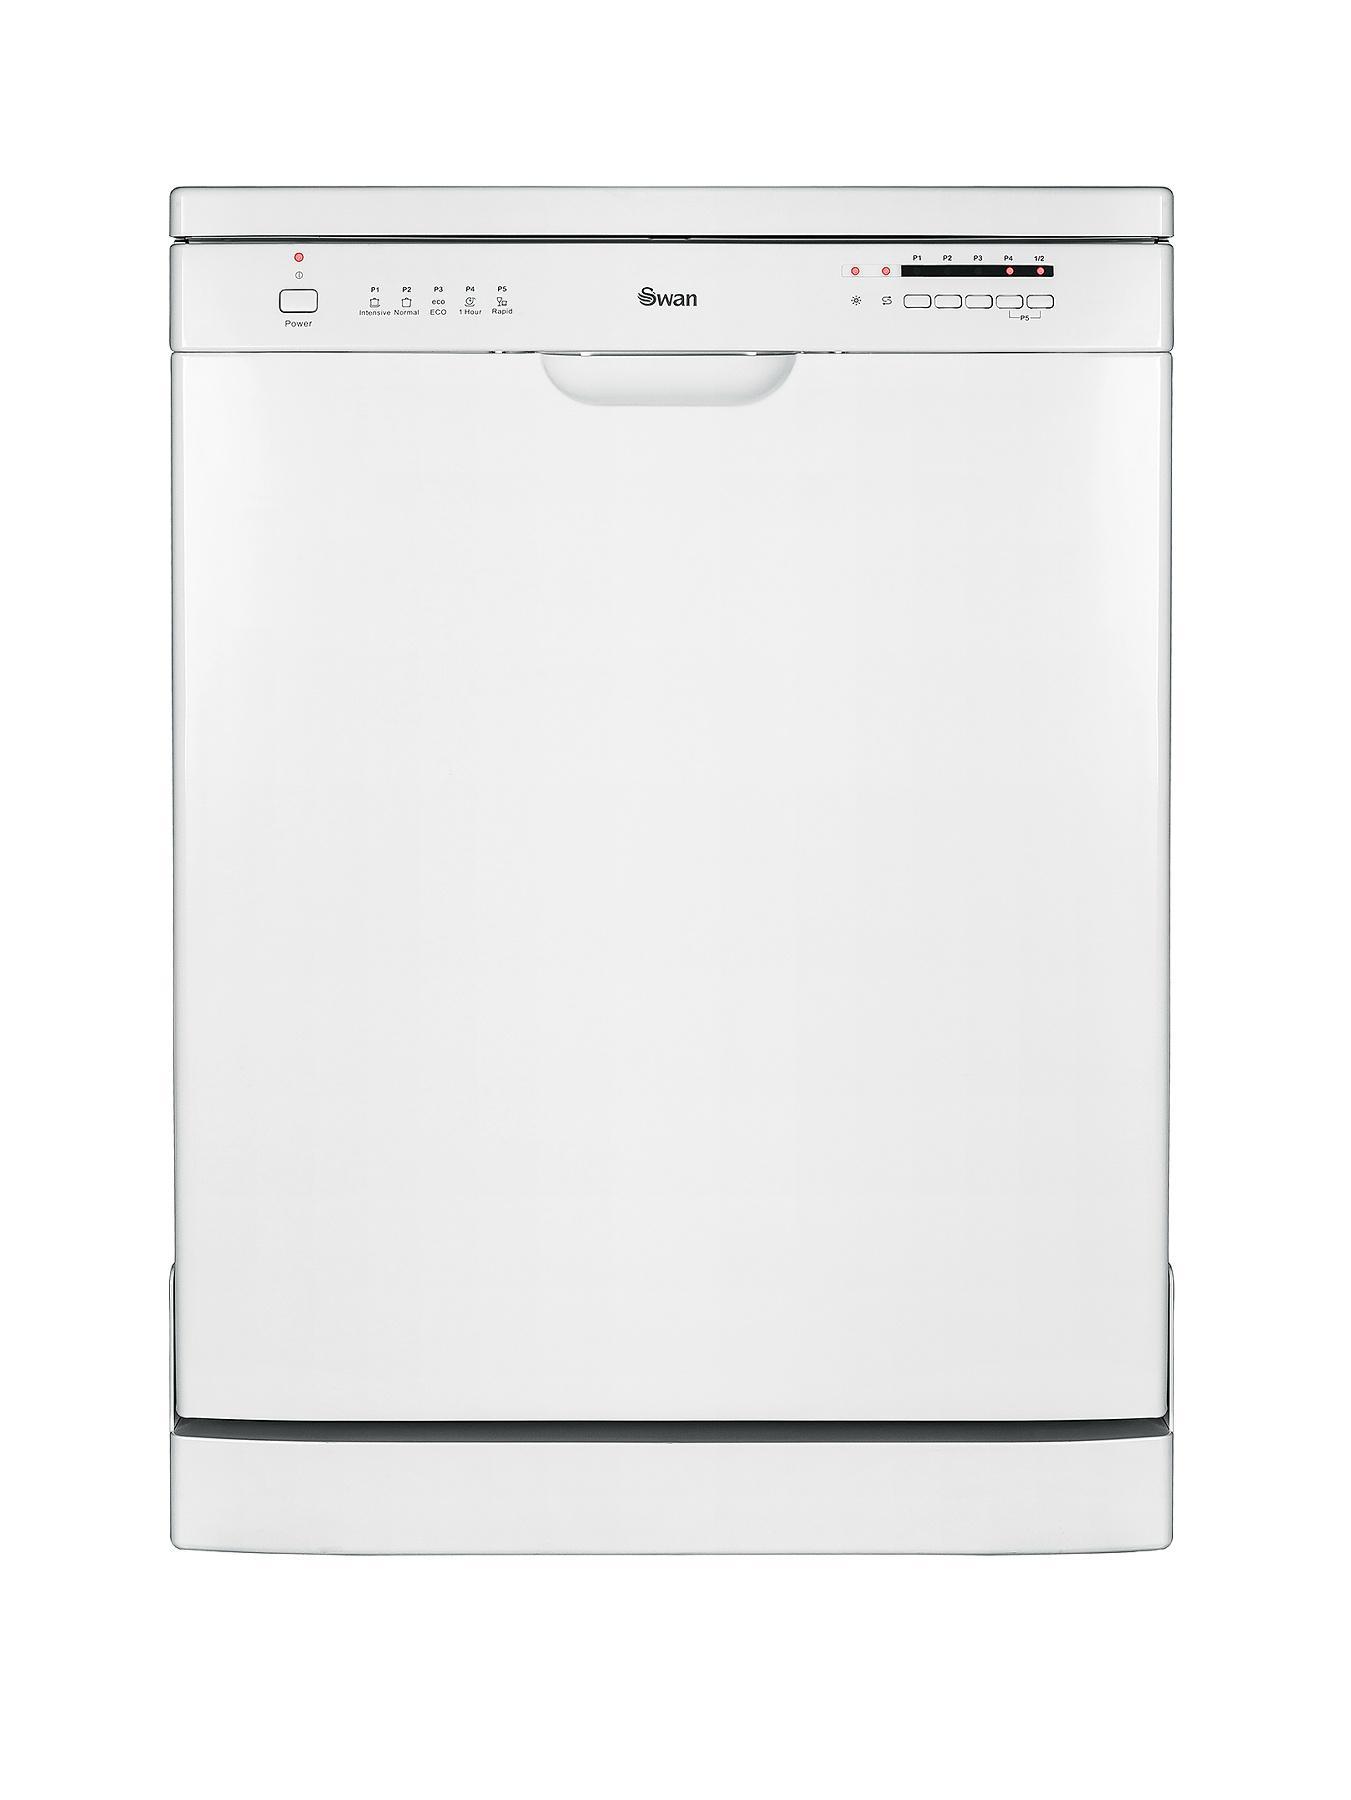 SDW7040W 12-Place Full Size Dishwasher - White at Littlewoods